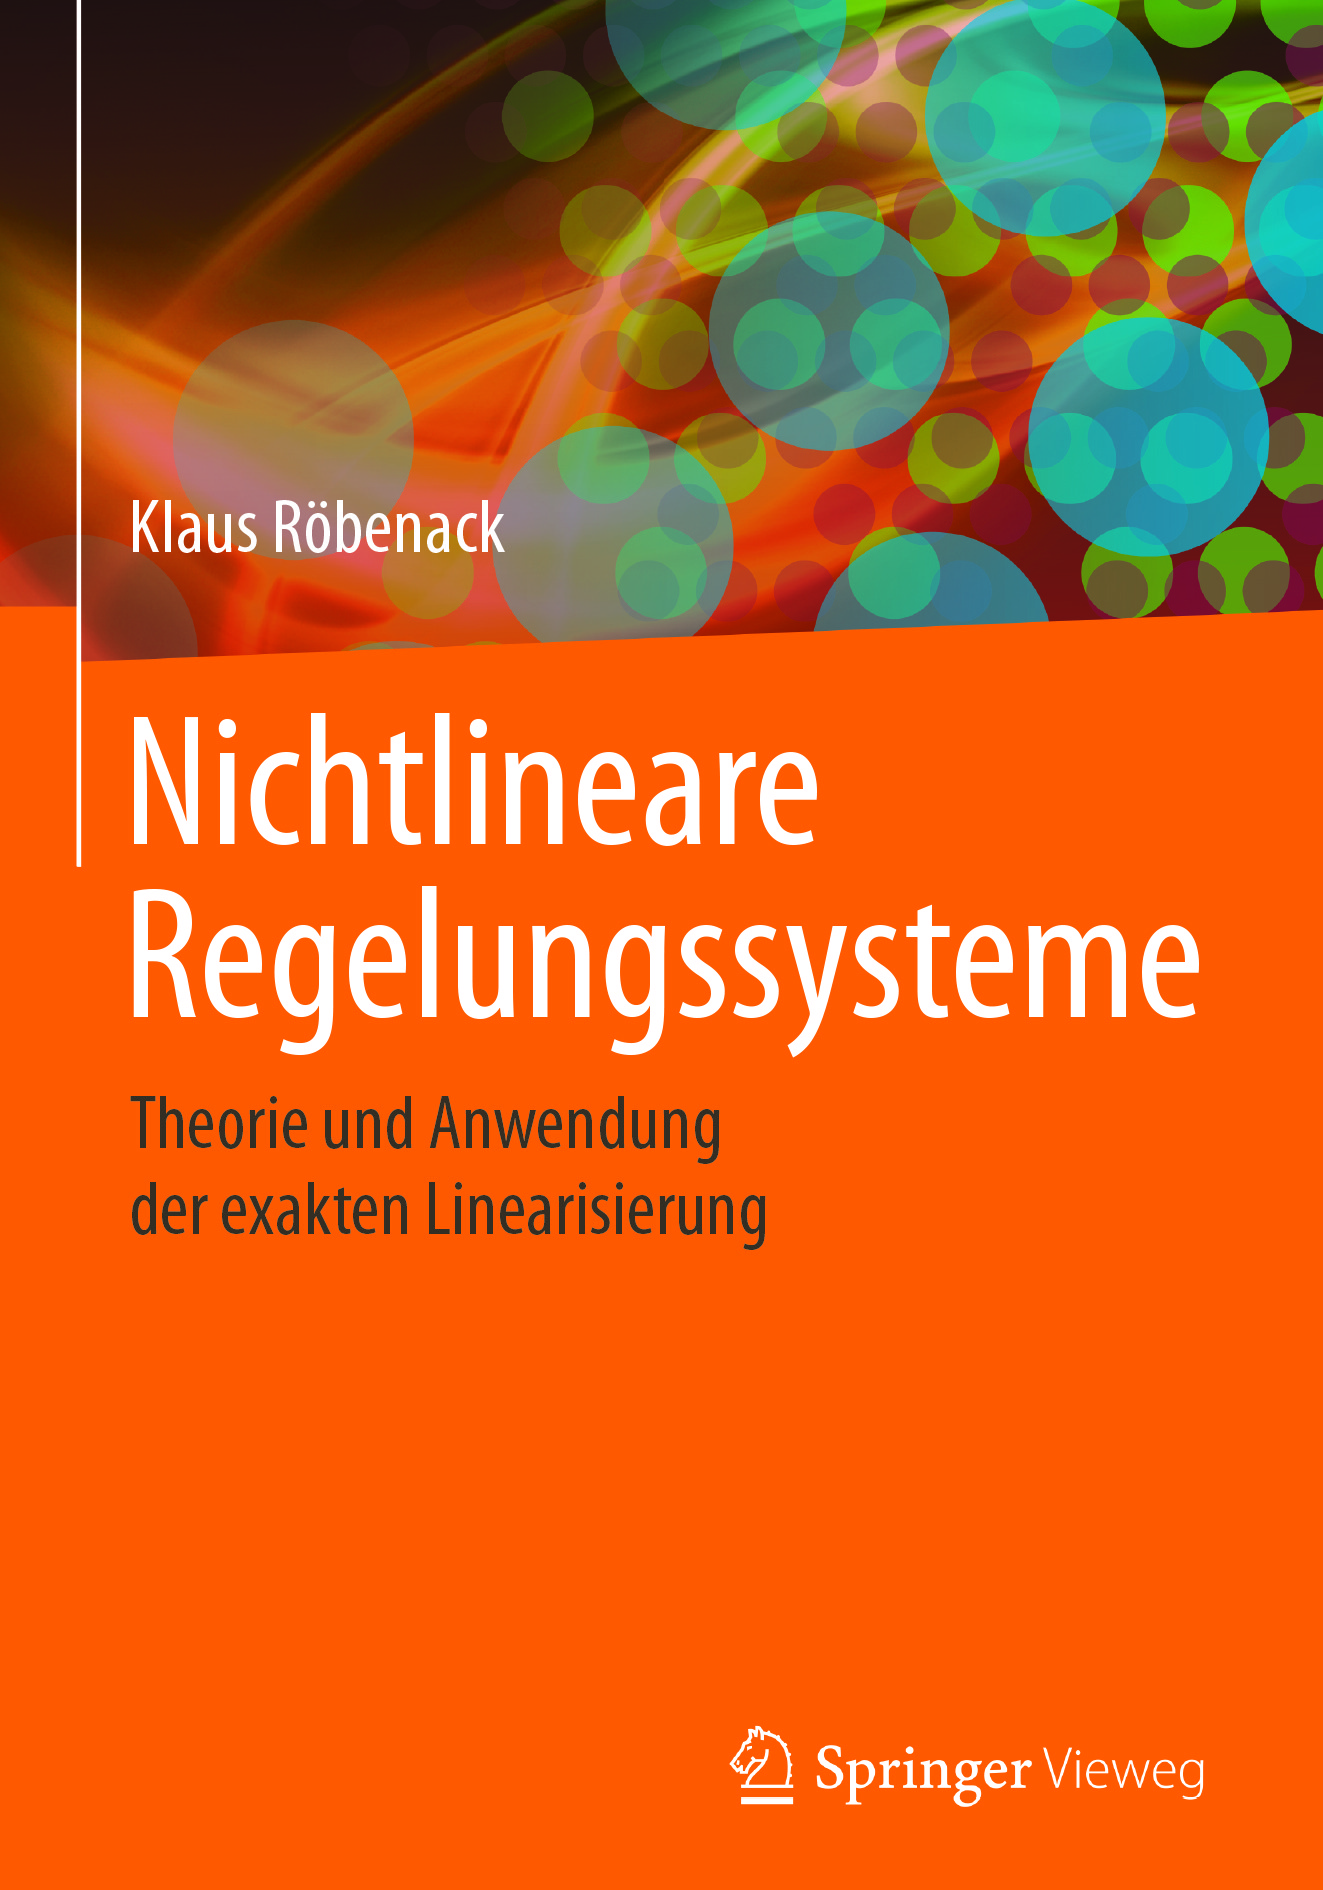 Röbenack, Klaus - Nichtlineare Regelungssysteme, ebook